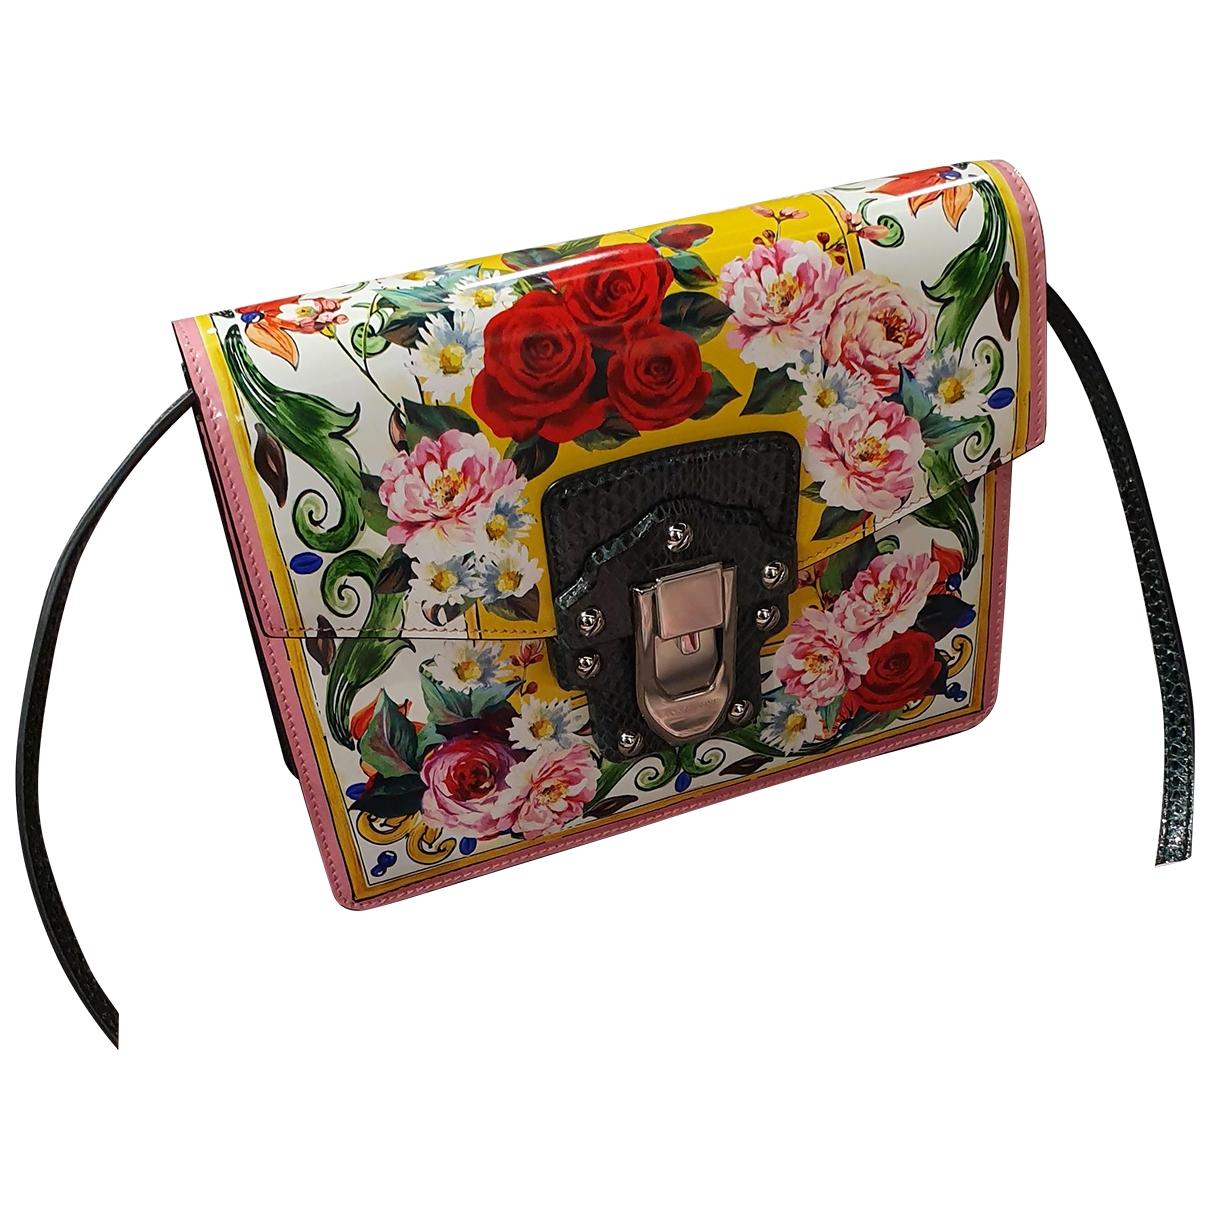 Dolce & Gabbana - Sac a main Lucia pour femme en cuir - multicolore